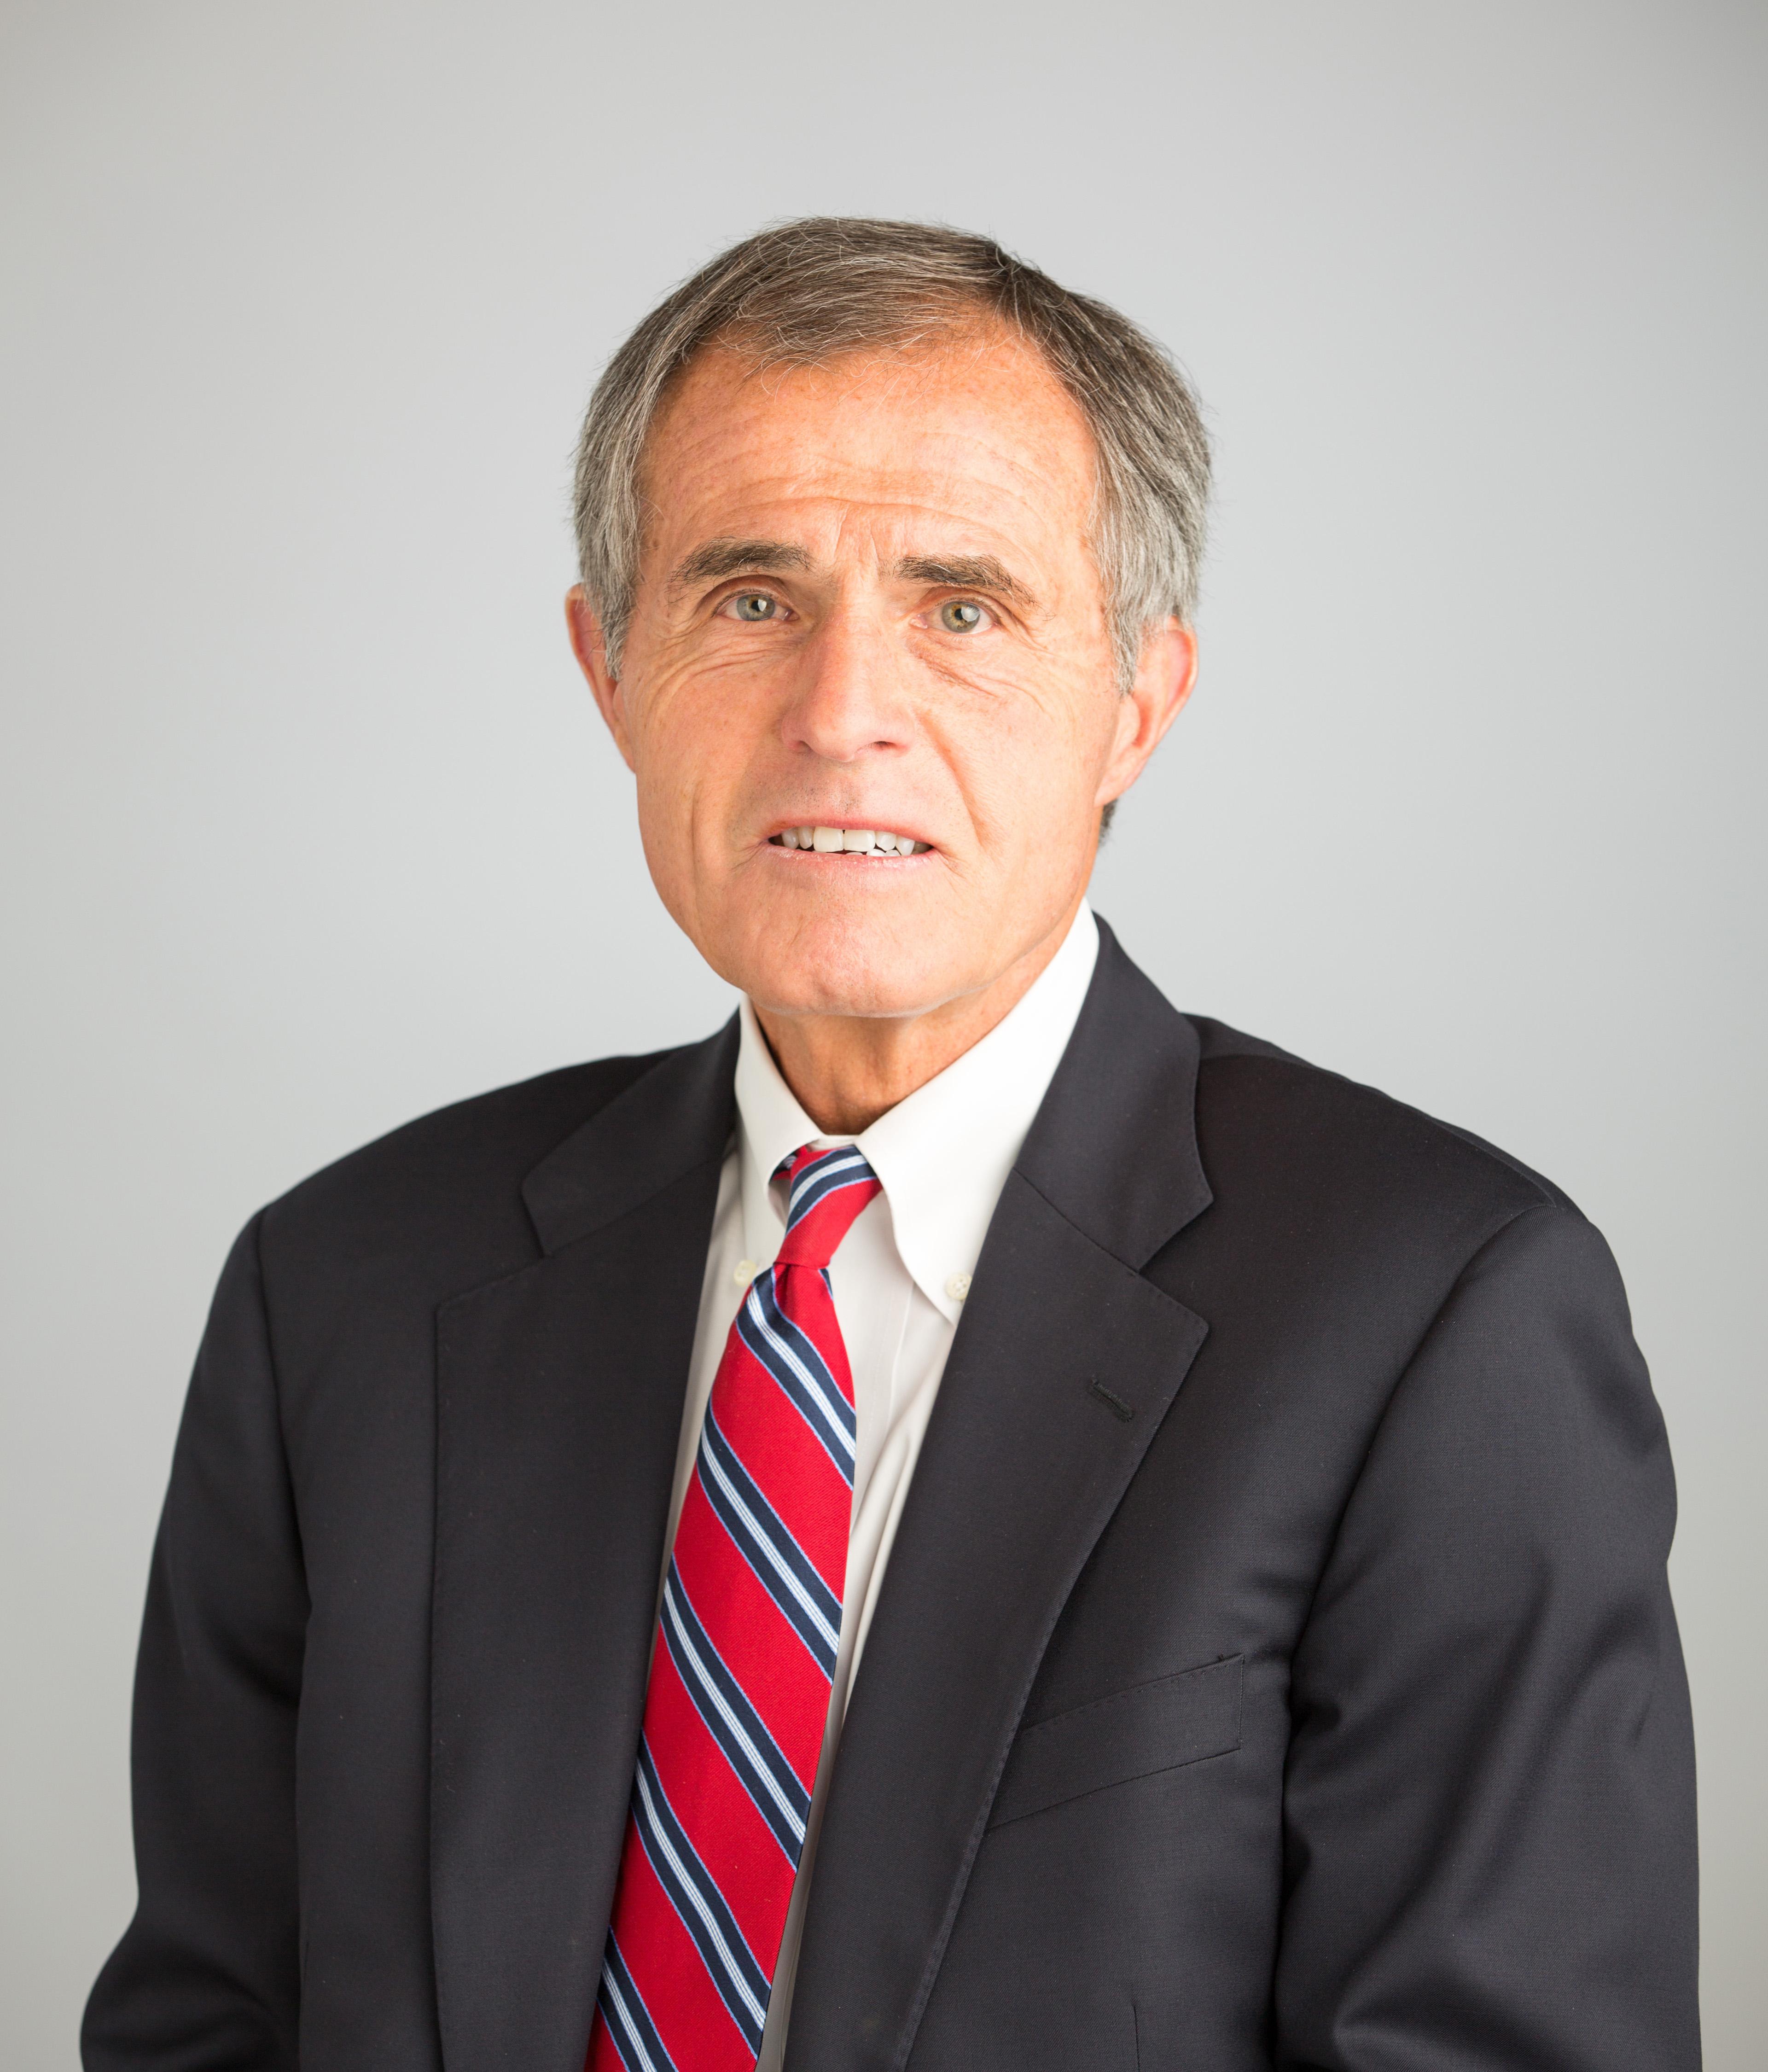 6/13/14 Rick Bossard, UMHS Government Relations